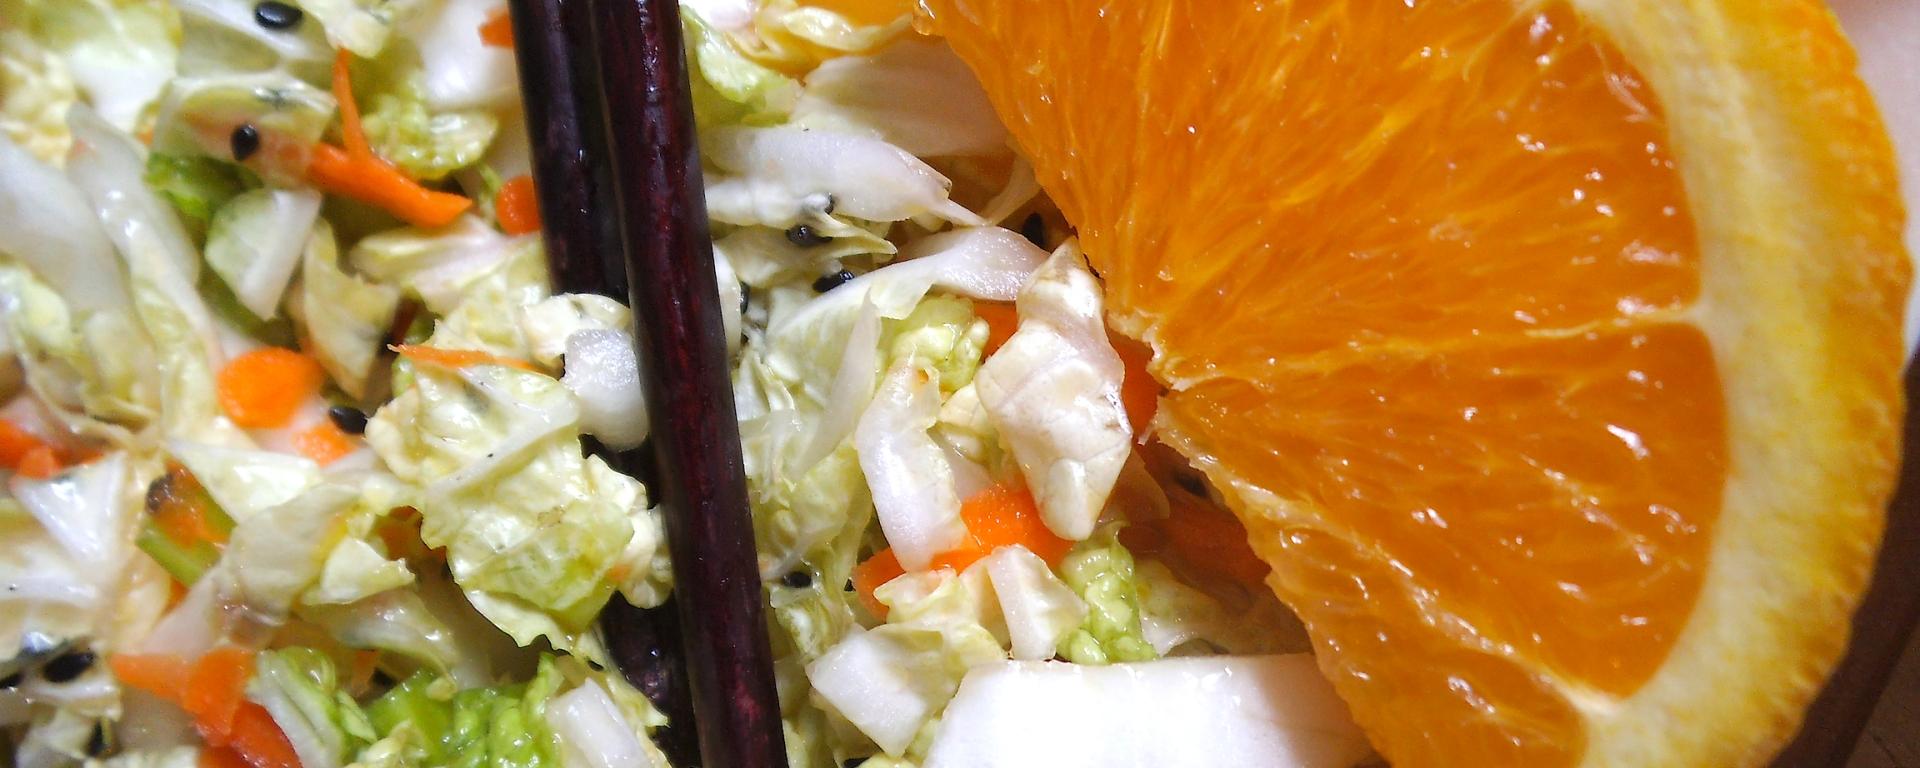 Napa Salad with Sesame Orange Dressing